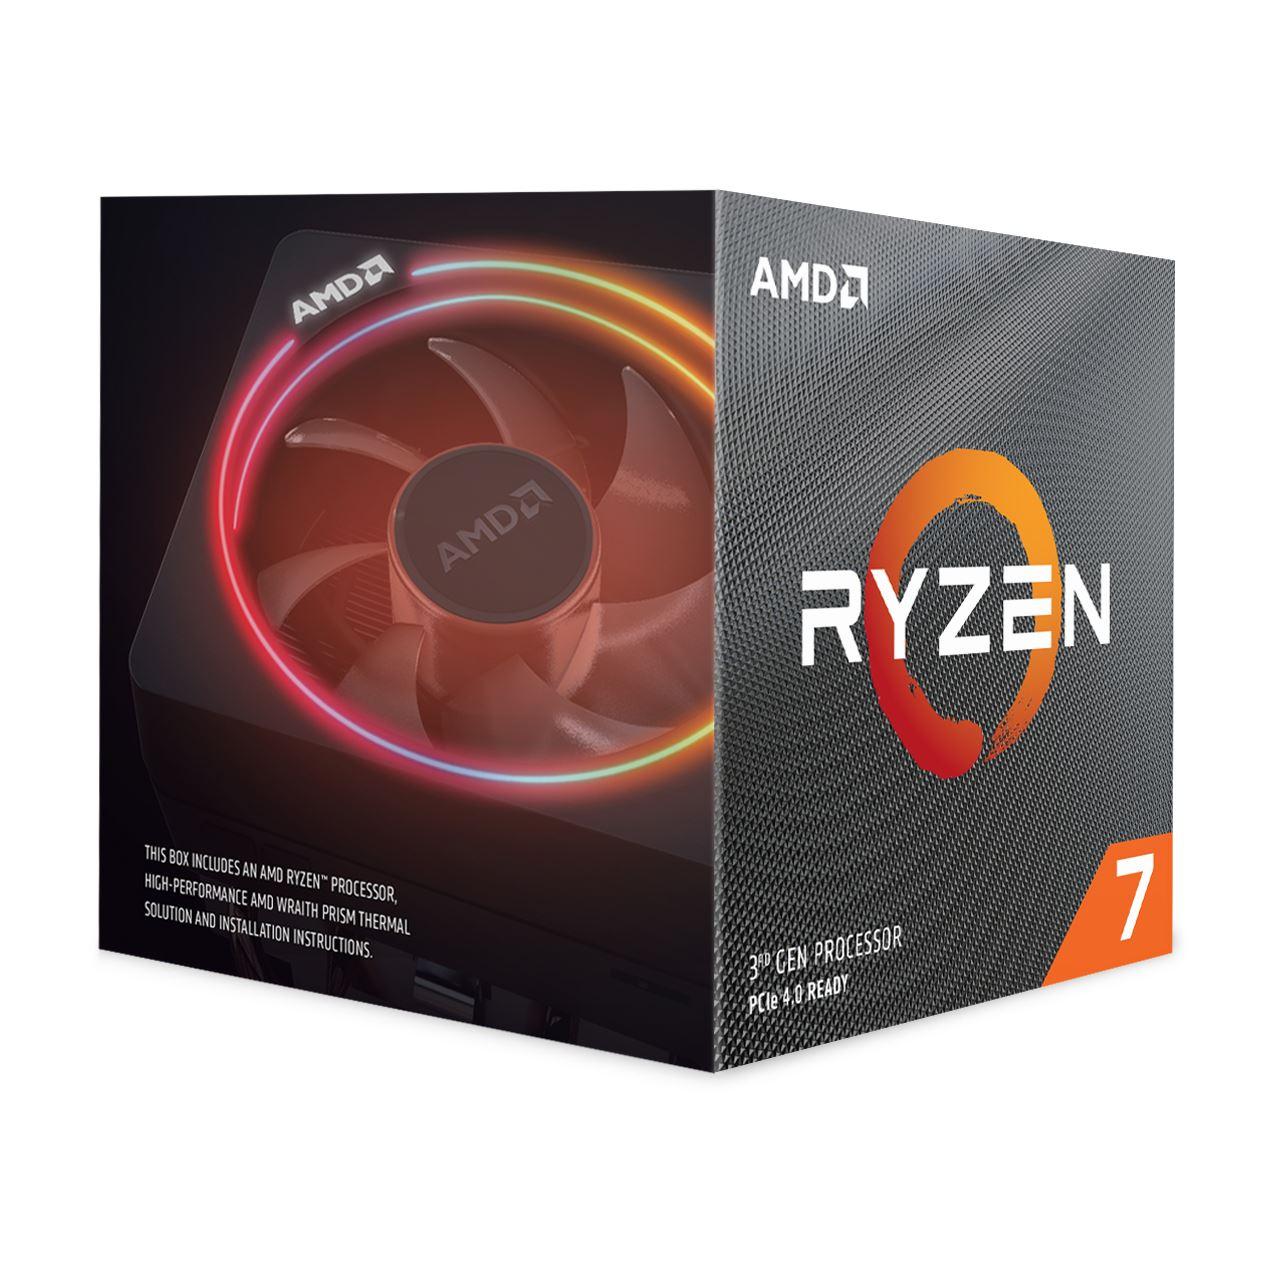 AMD Ryzen 7 3700X inkl. Wraith Prism Kühler